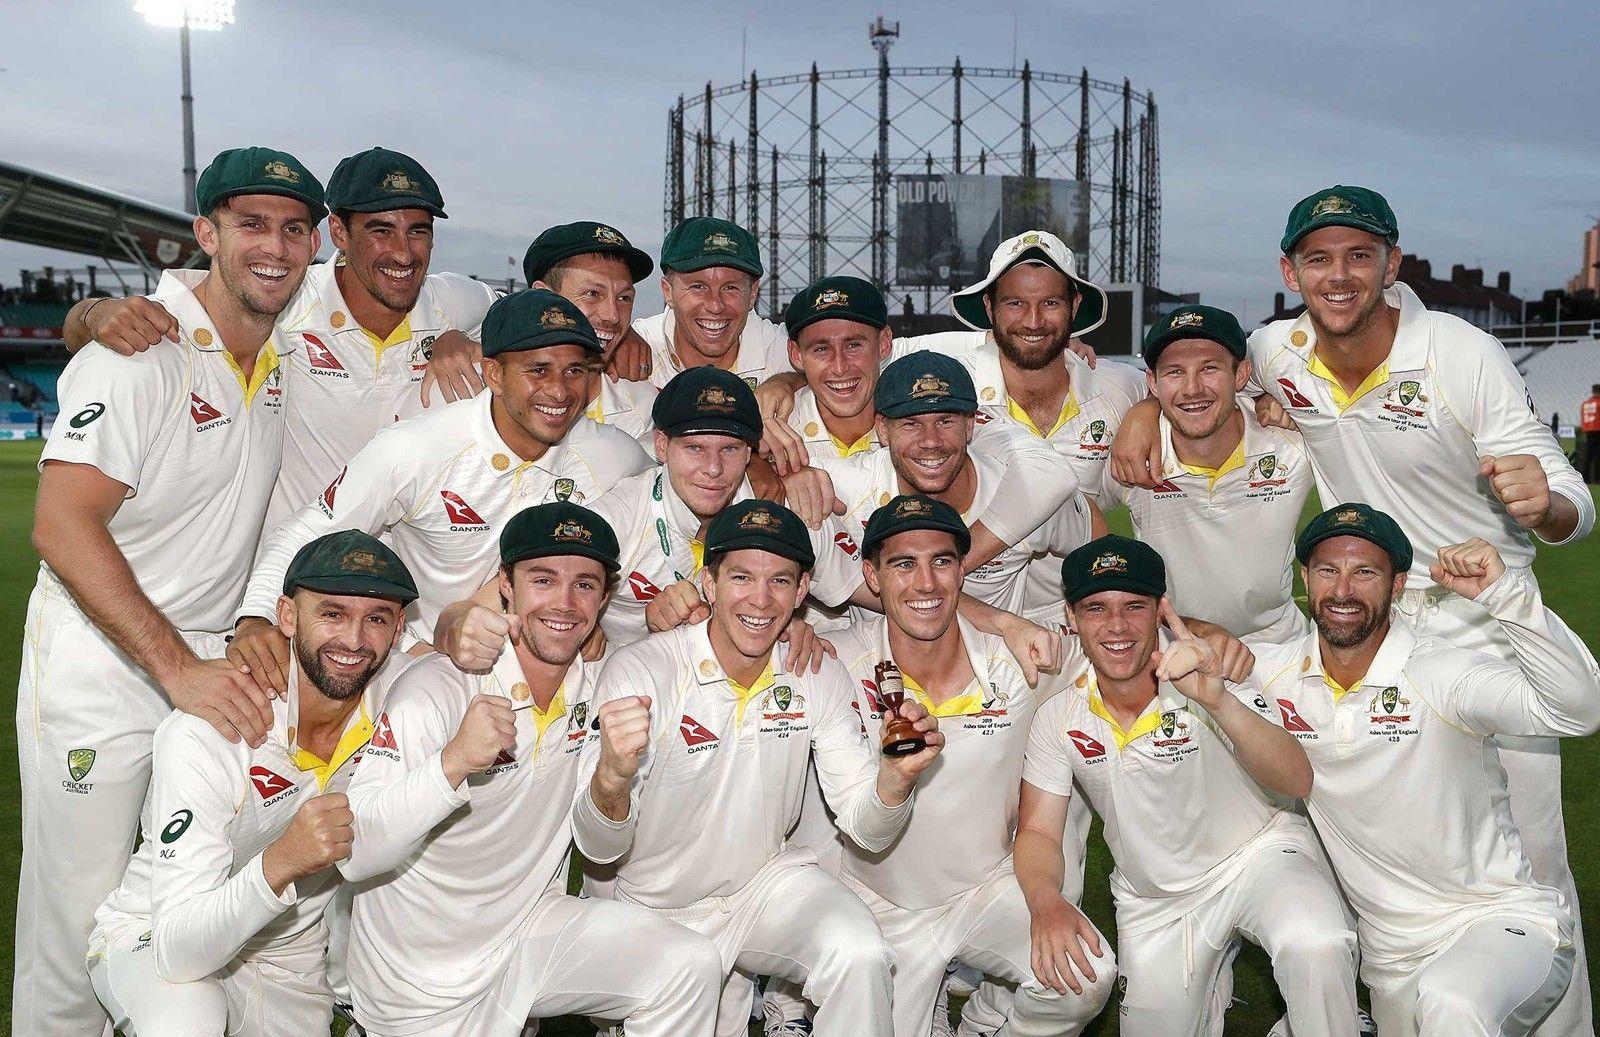 Pin by Honeywell18 on Aussie Cricketers Australia